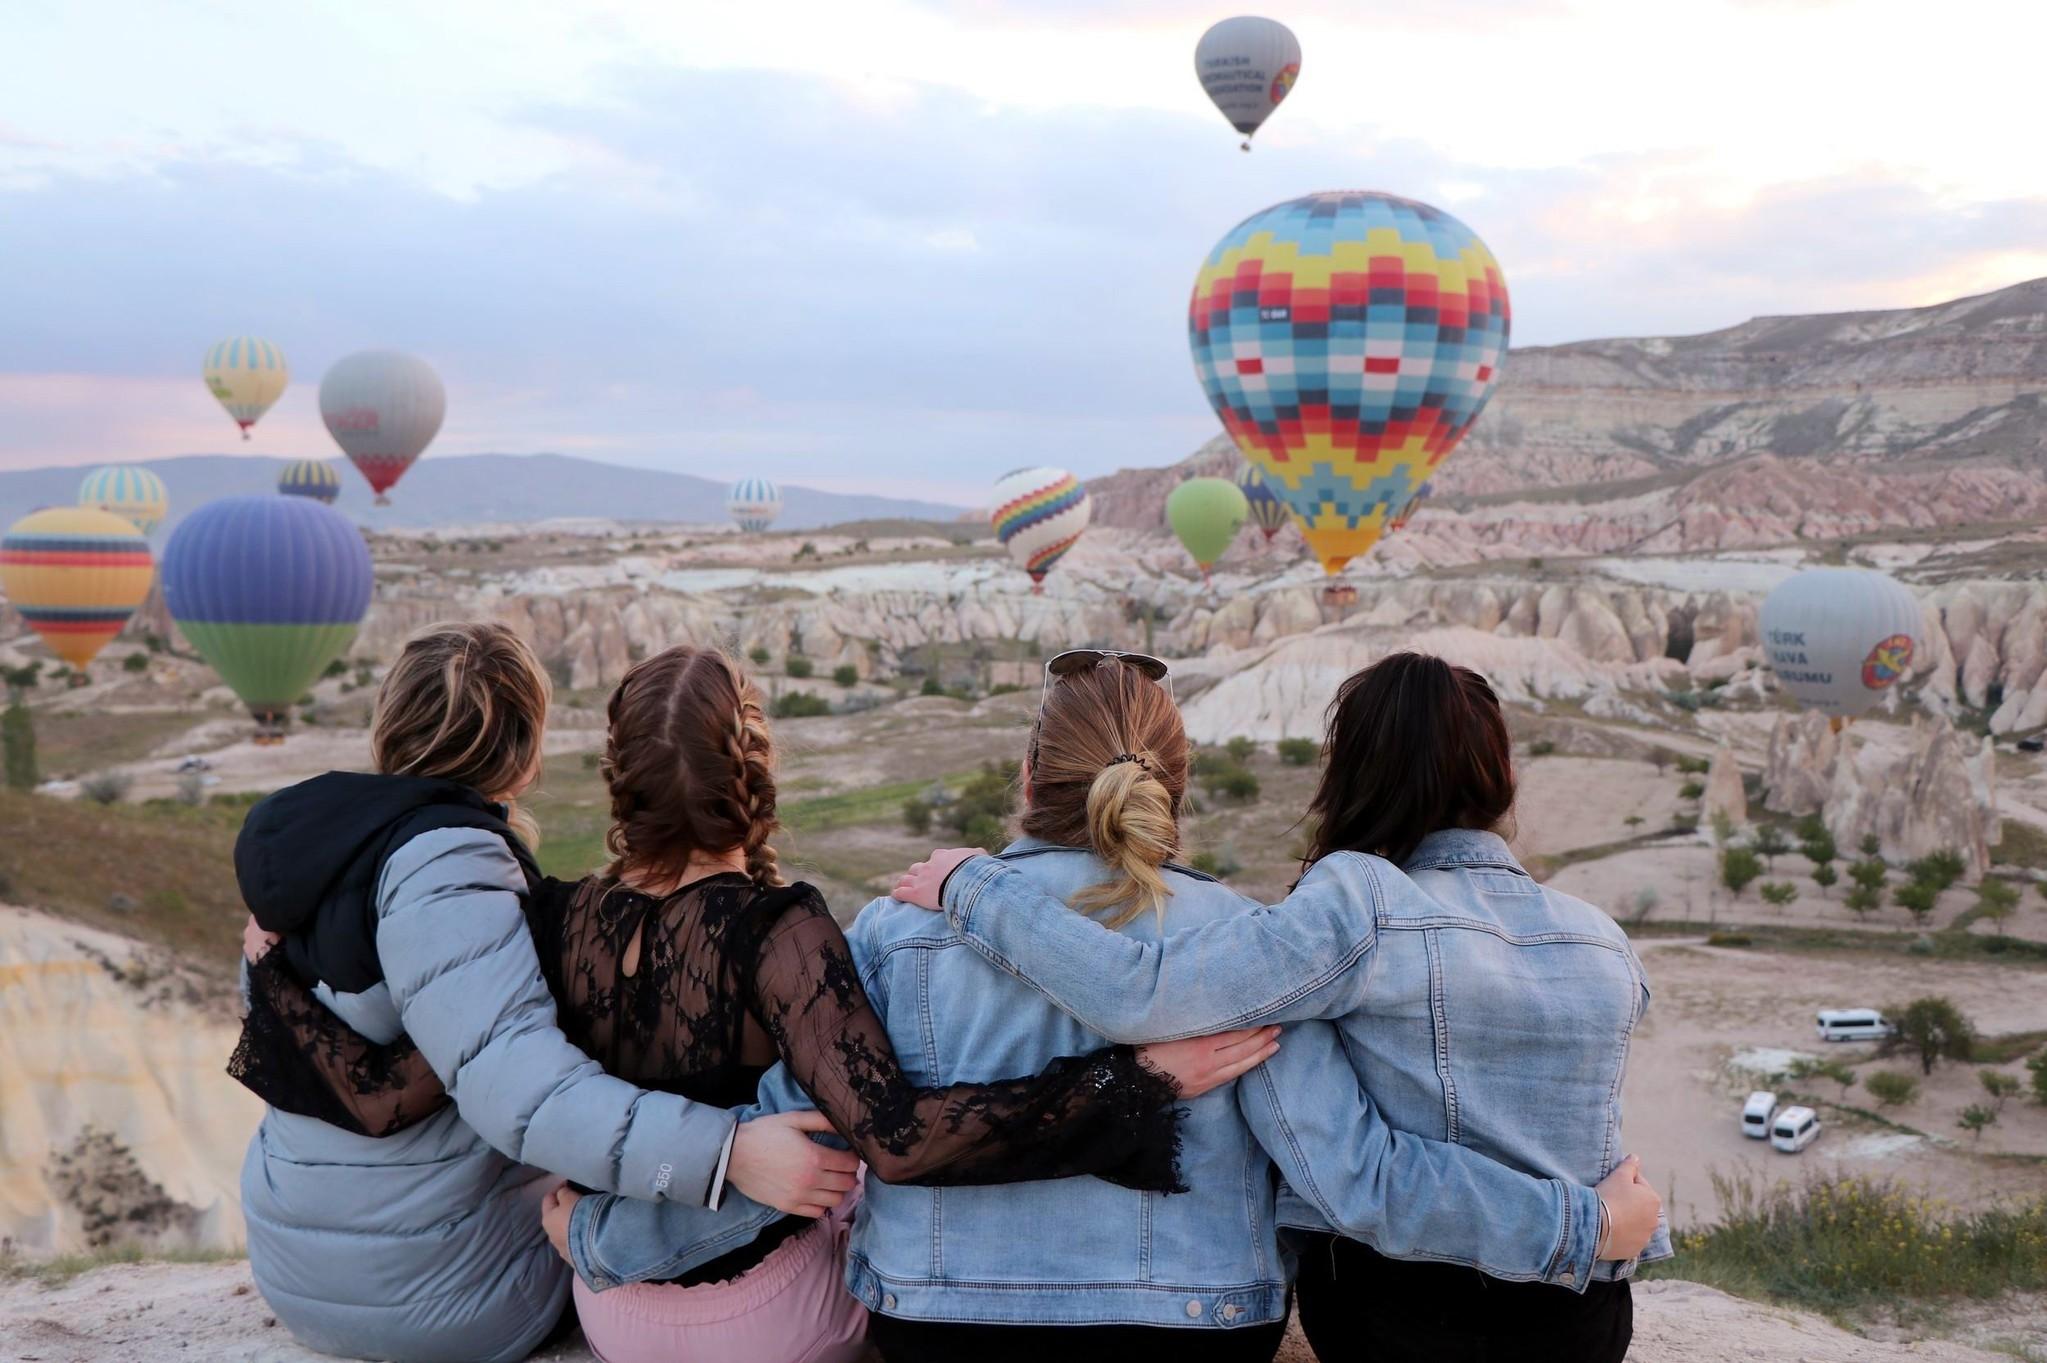 Turkey welcomed around 32.4 million tourists in 2017, according to the Turkish Statistical Institute (TurkStat).